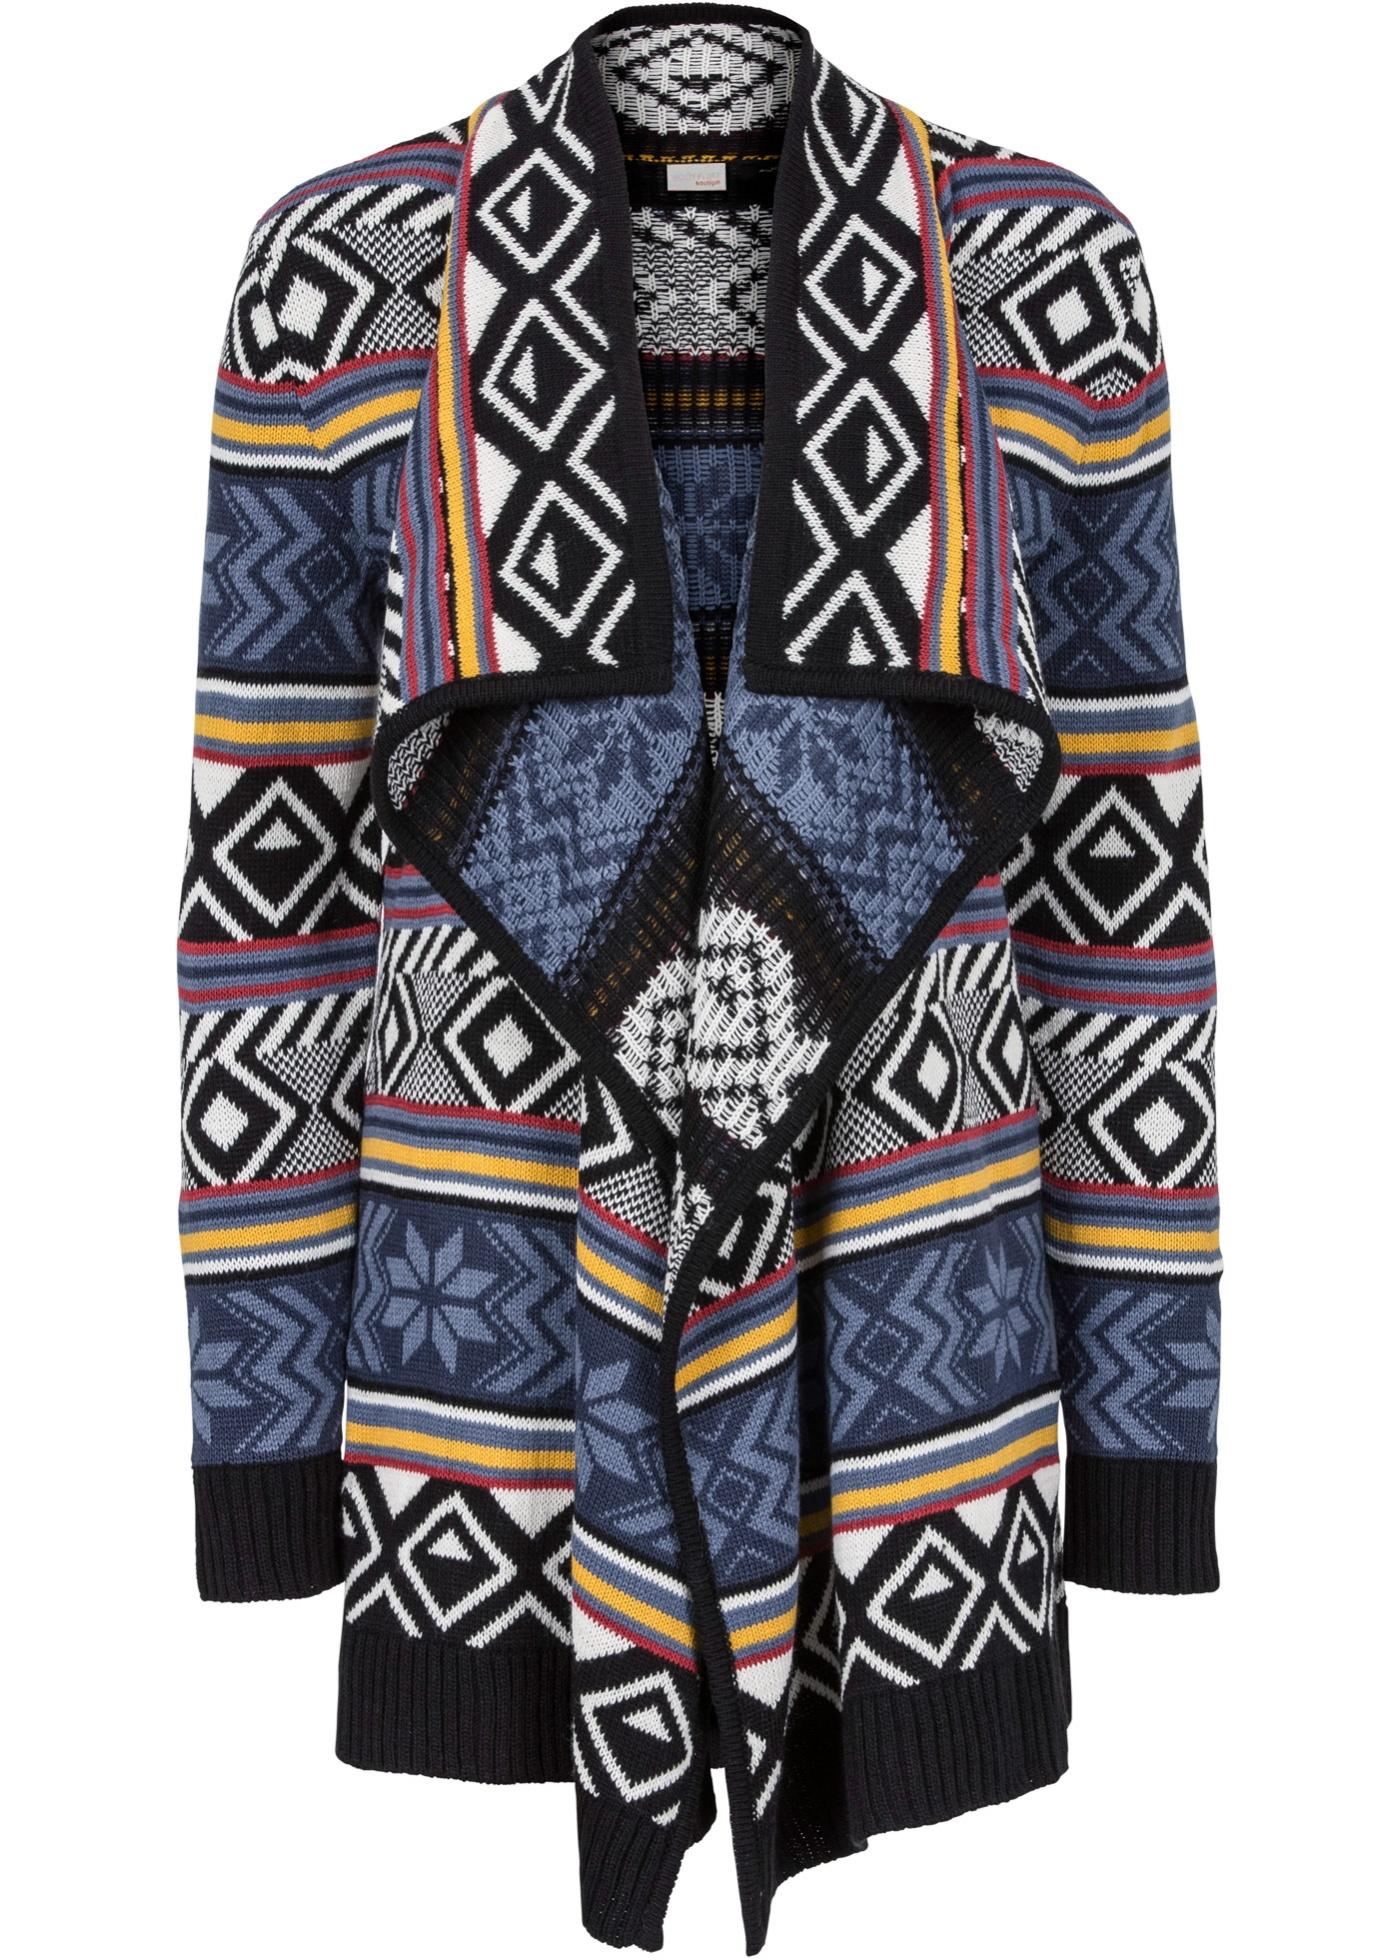 Pletený kabátek - Černá